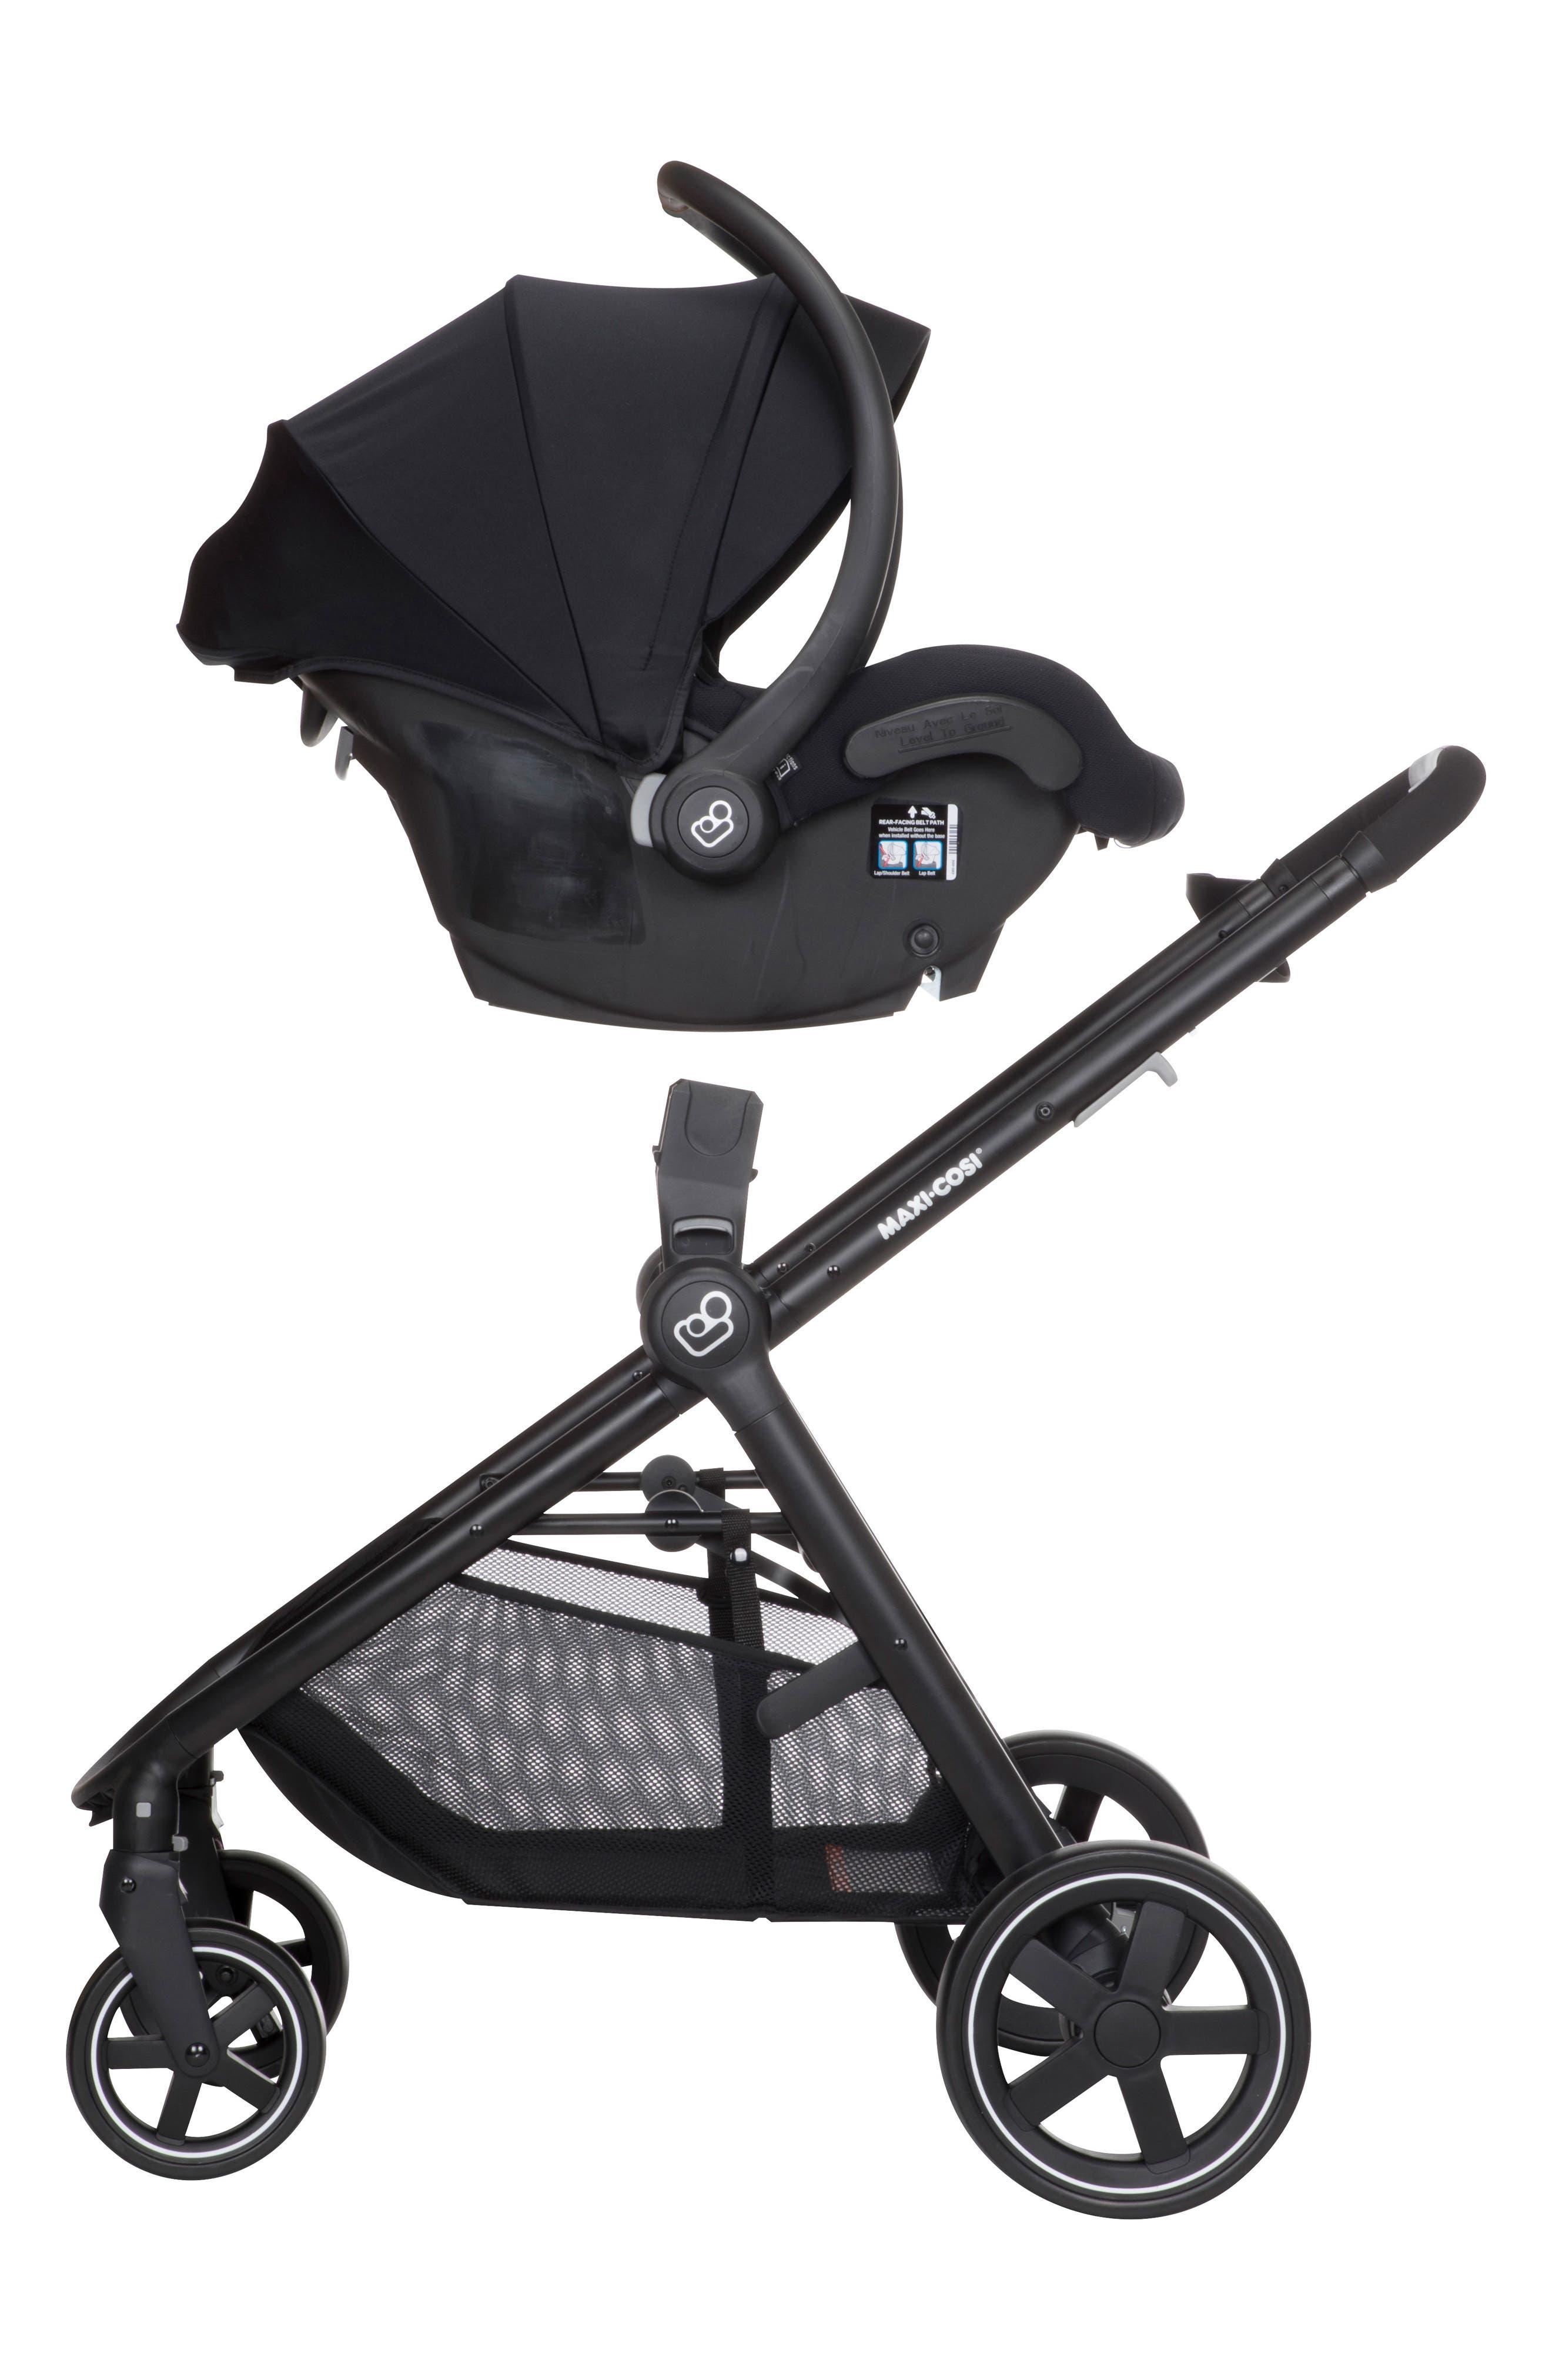 5-1 Mico 30 Infant Car Seat & Zelia Stroller Modular Travel System,                             Alternate thumbnail 2, color,                             NIGHT BLACK